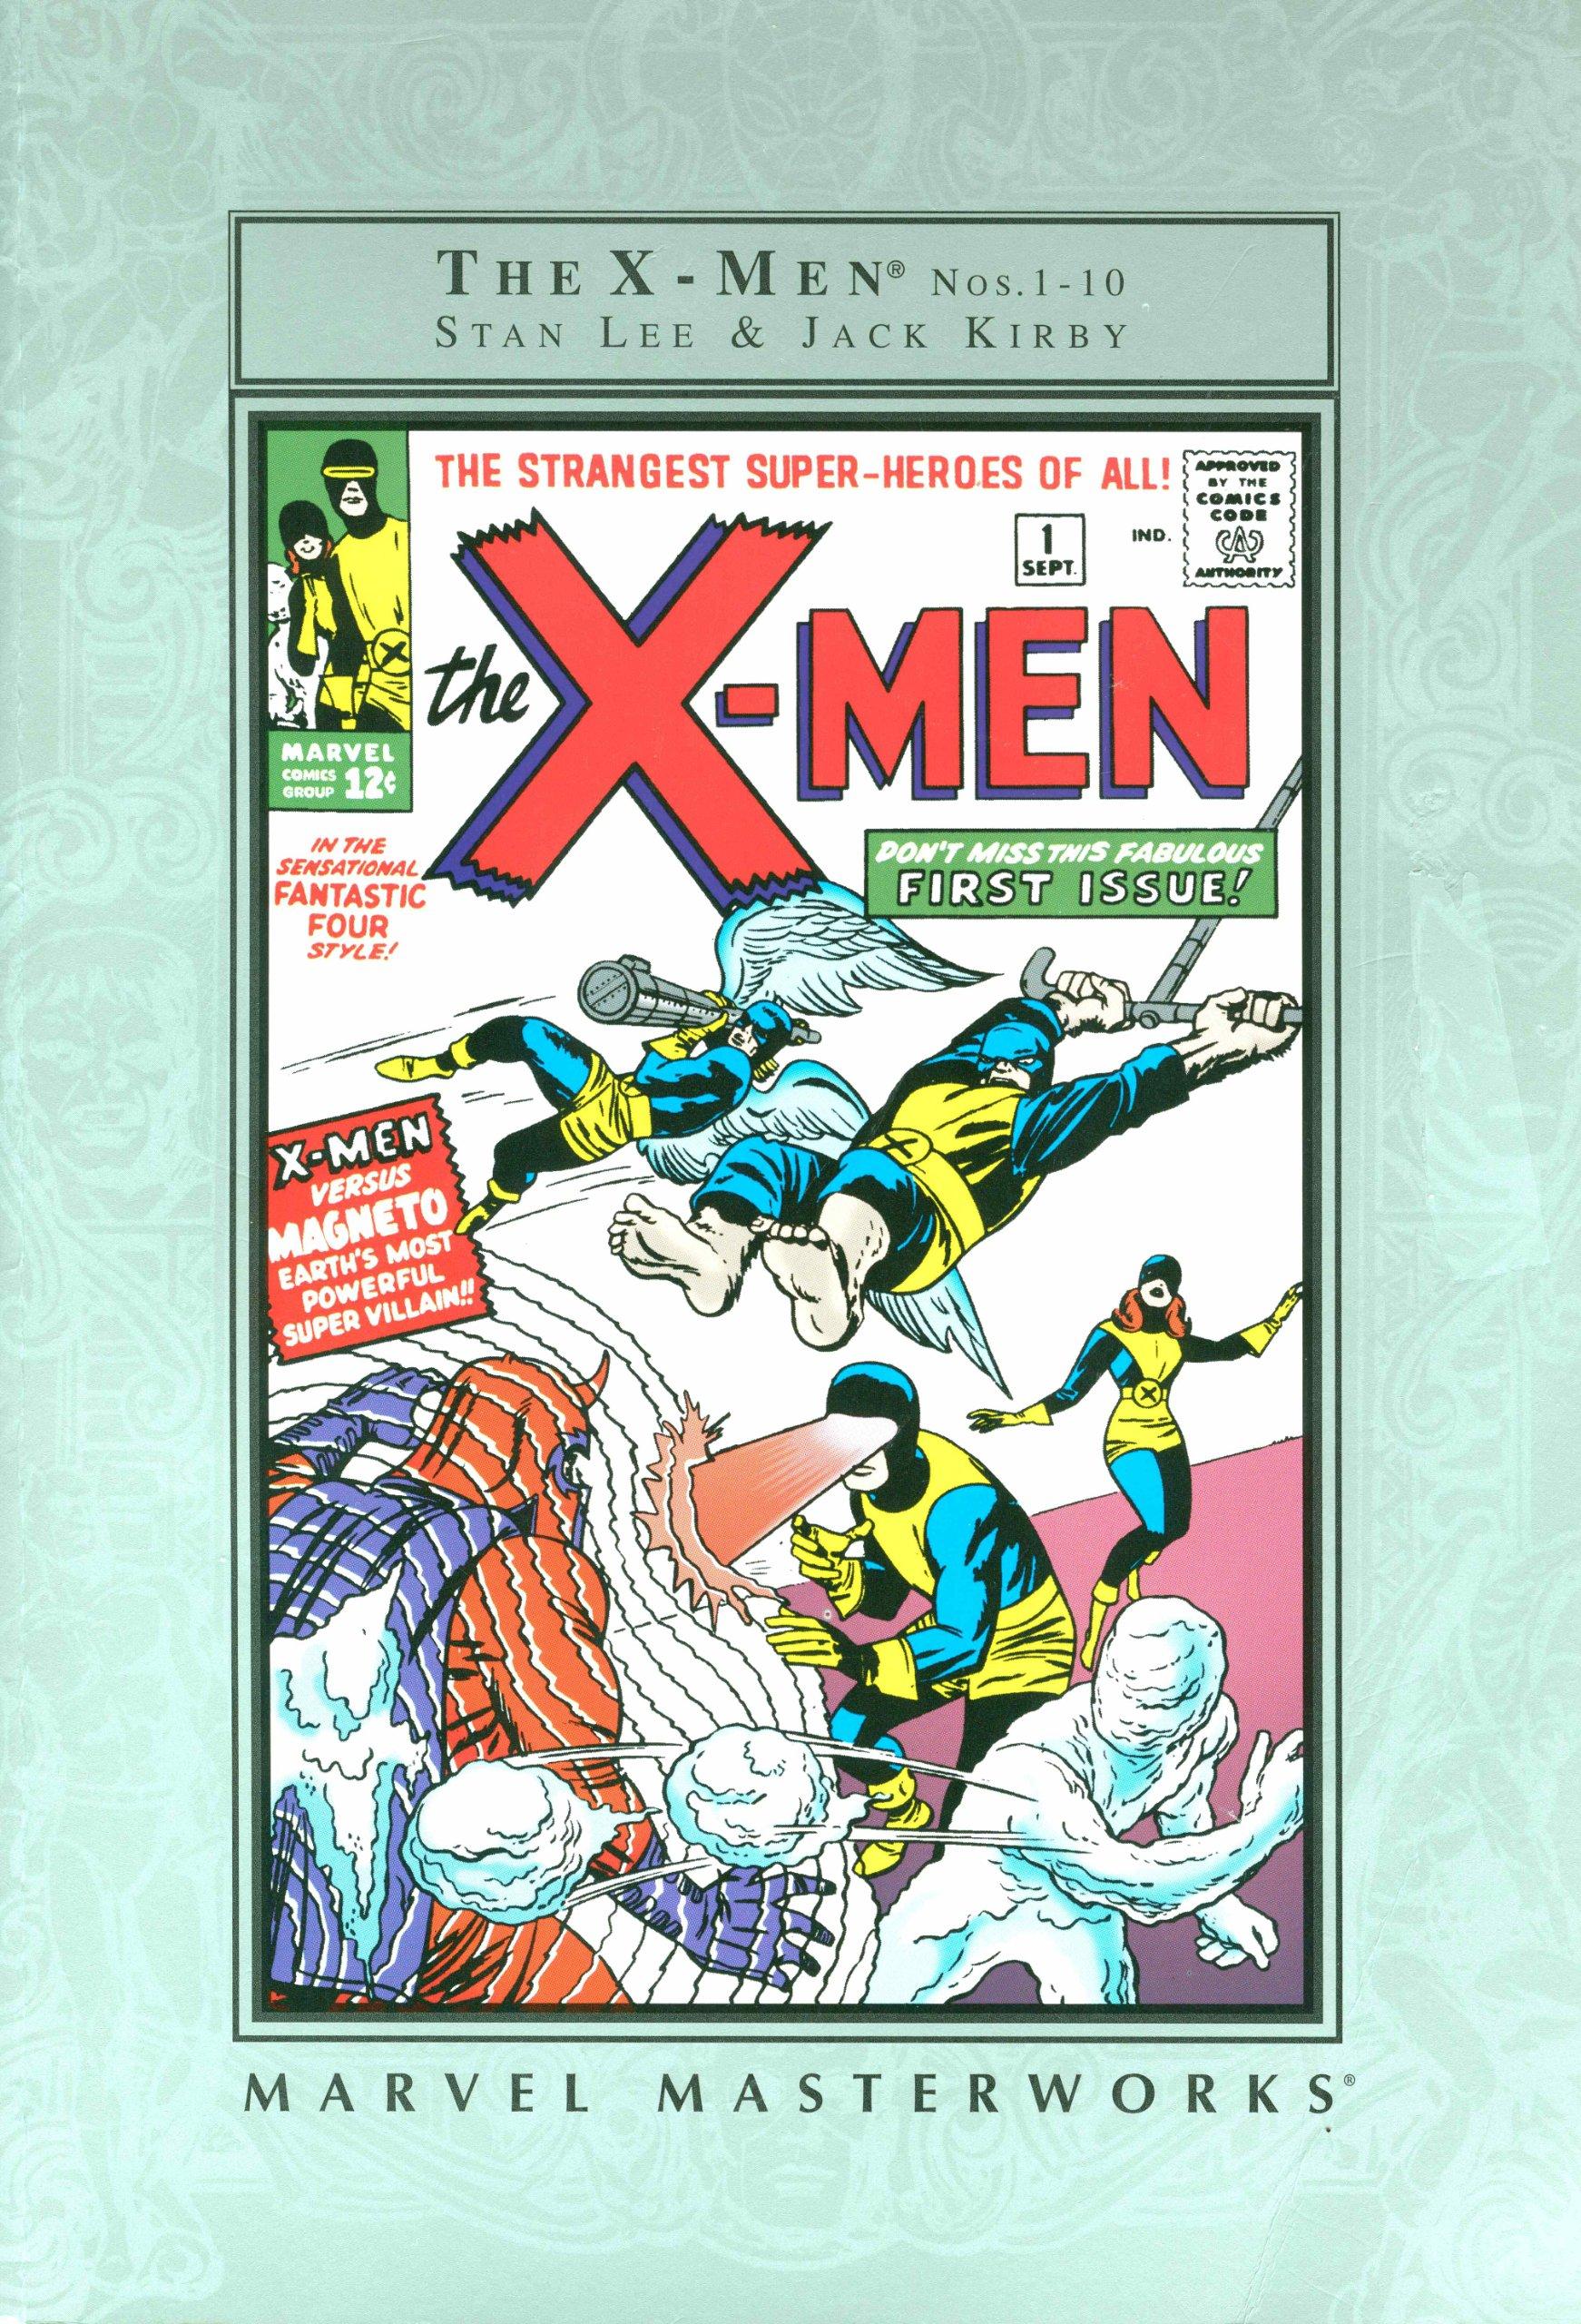 The X-men Nos. 1- 10 (Marvel Masterworks, Volume 1) PDF